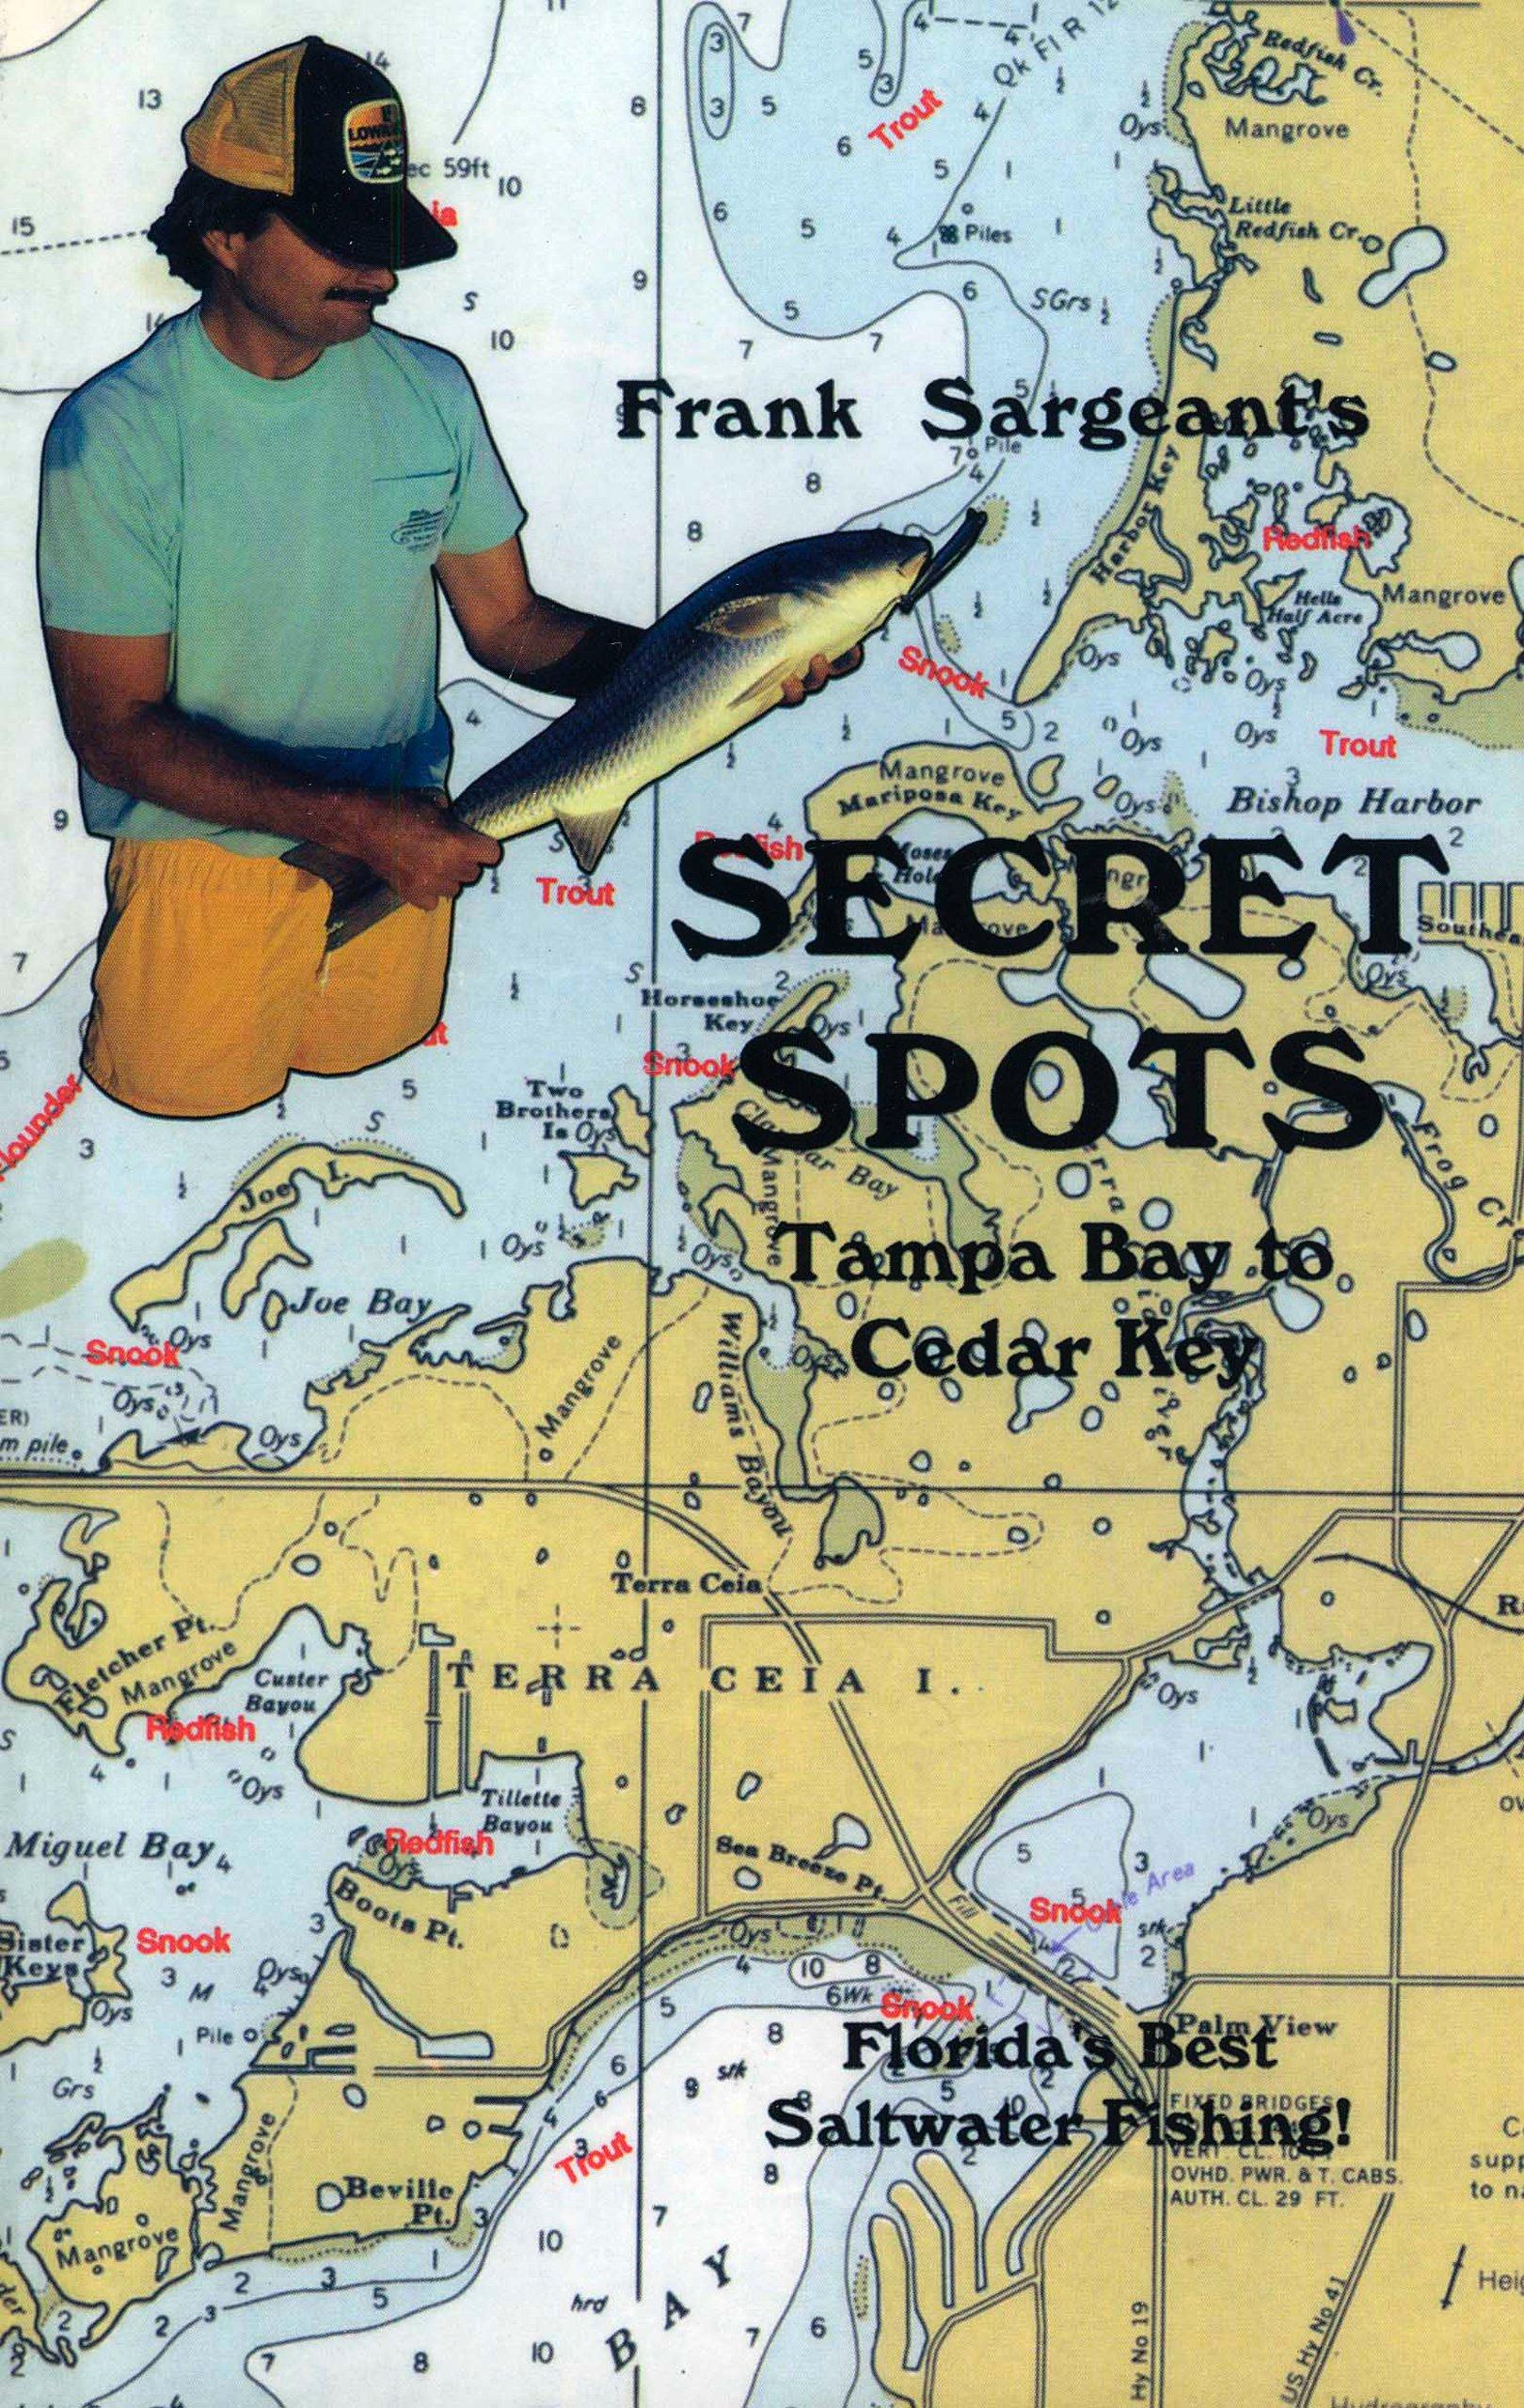 Cedar Key Florida Map.Secret Spots Tampa Bay To Cedar Key Tampa Bay To Cedar Key